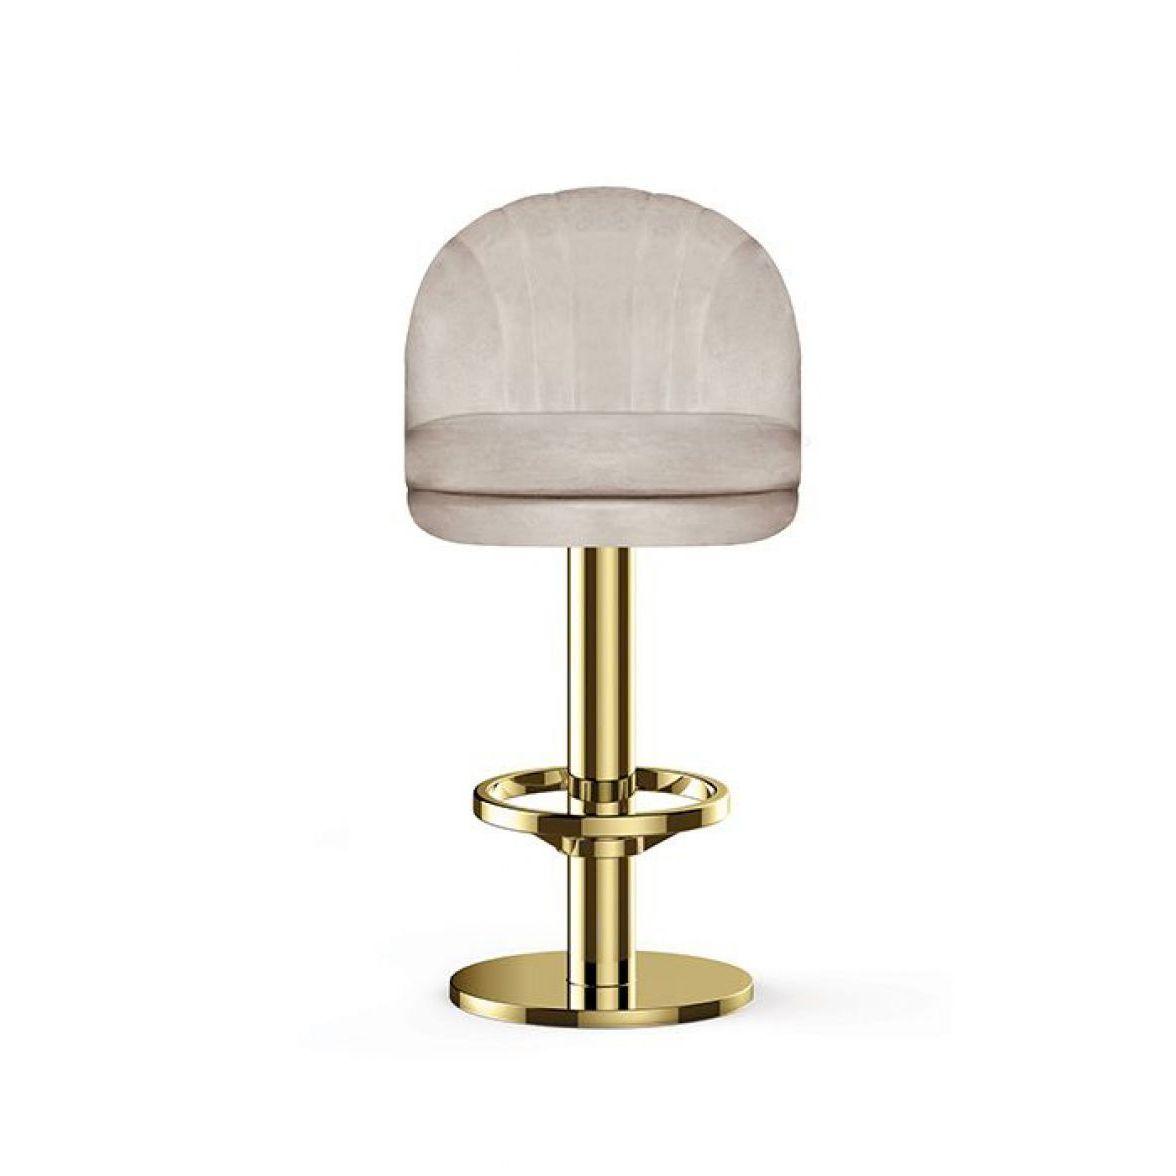 Gable Bar Chair